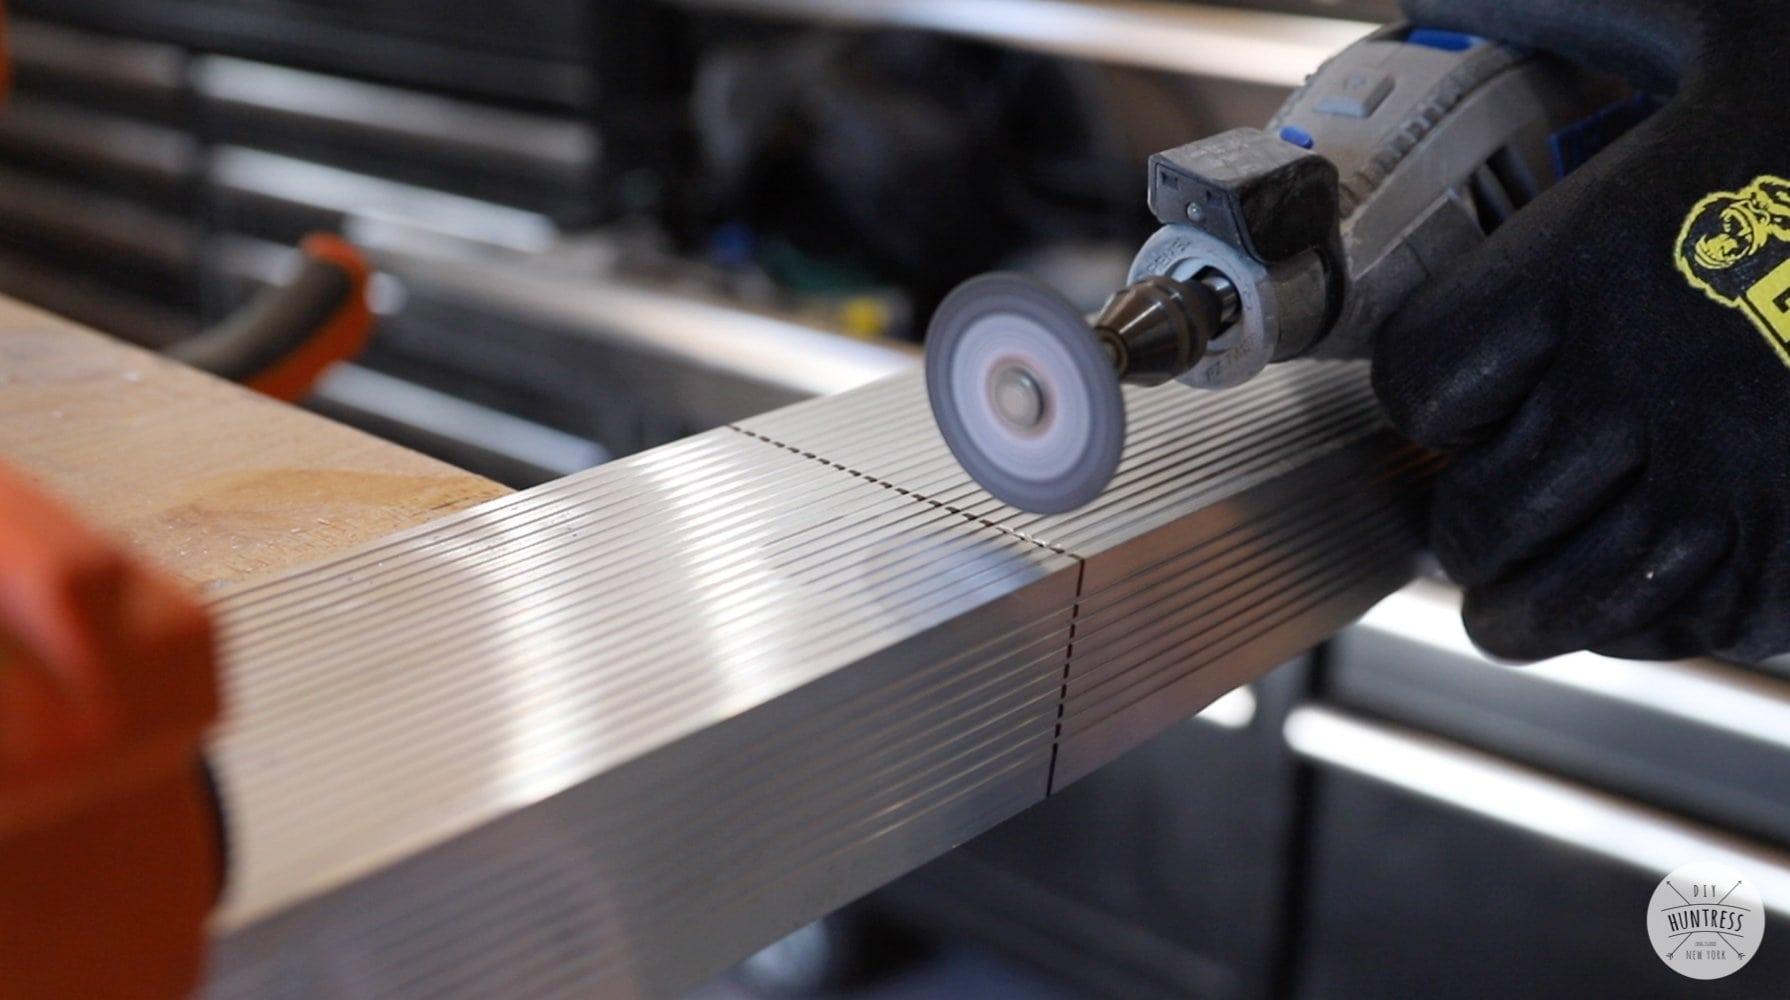 cutting metal with a dremel